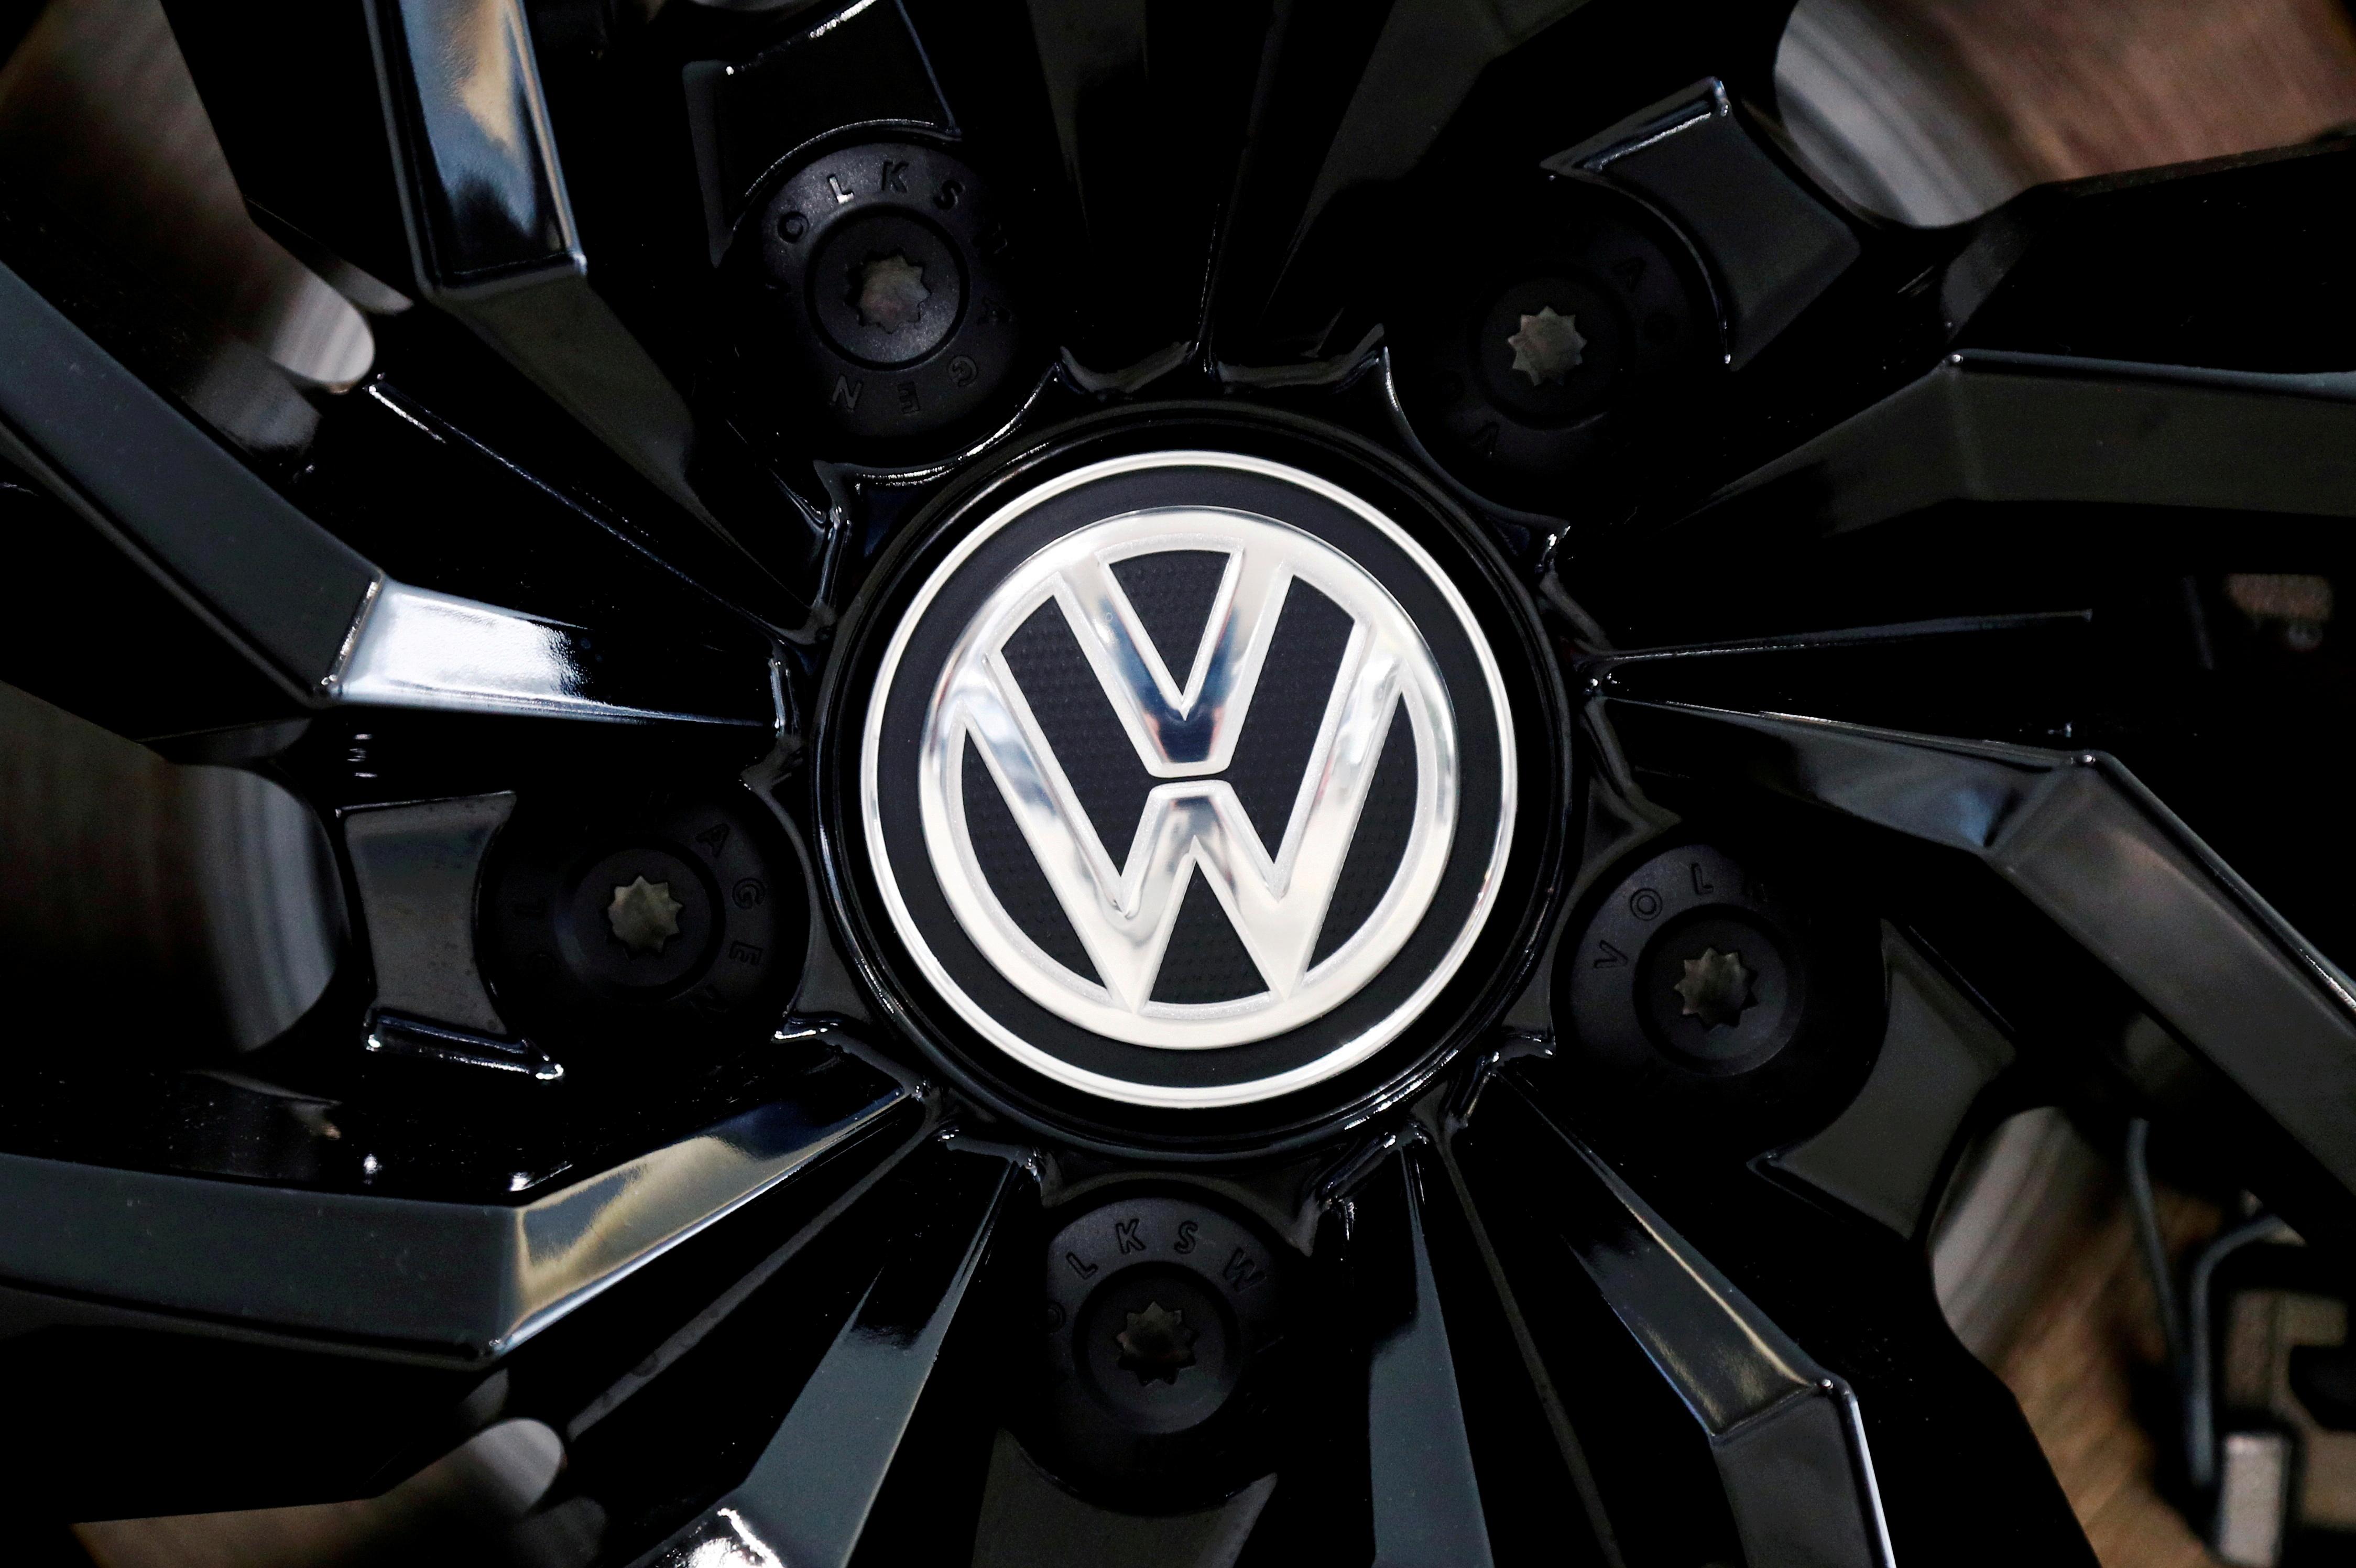 The logo of German carmaker Volkswagen is seen on a rim cap in a showroom of a Volkswagen car dealer in Brussels, Belgium July 9, 2020. REUTERS/Francois Lenoir/File Photo